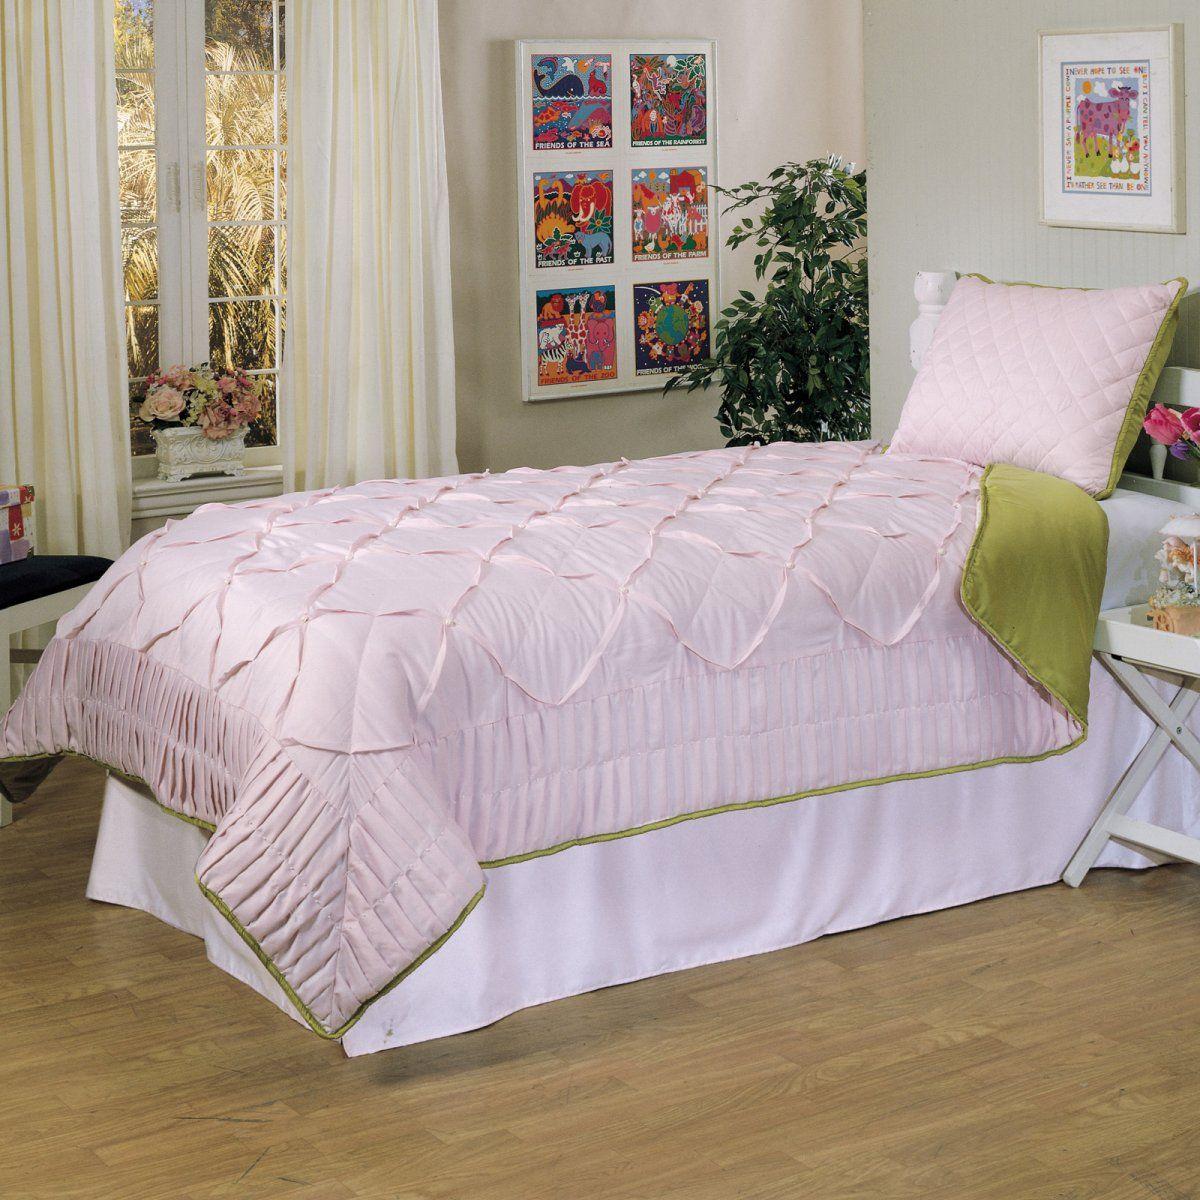 Kathy Ireland Home By Hallmart Collectibles Princess Pearl